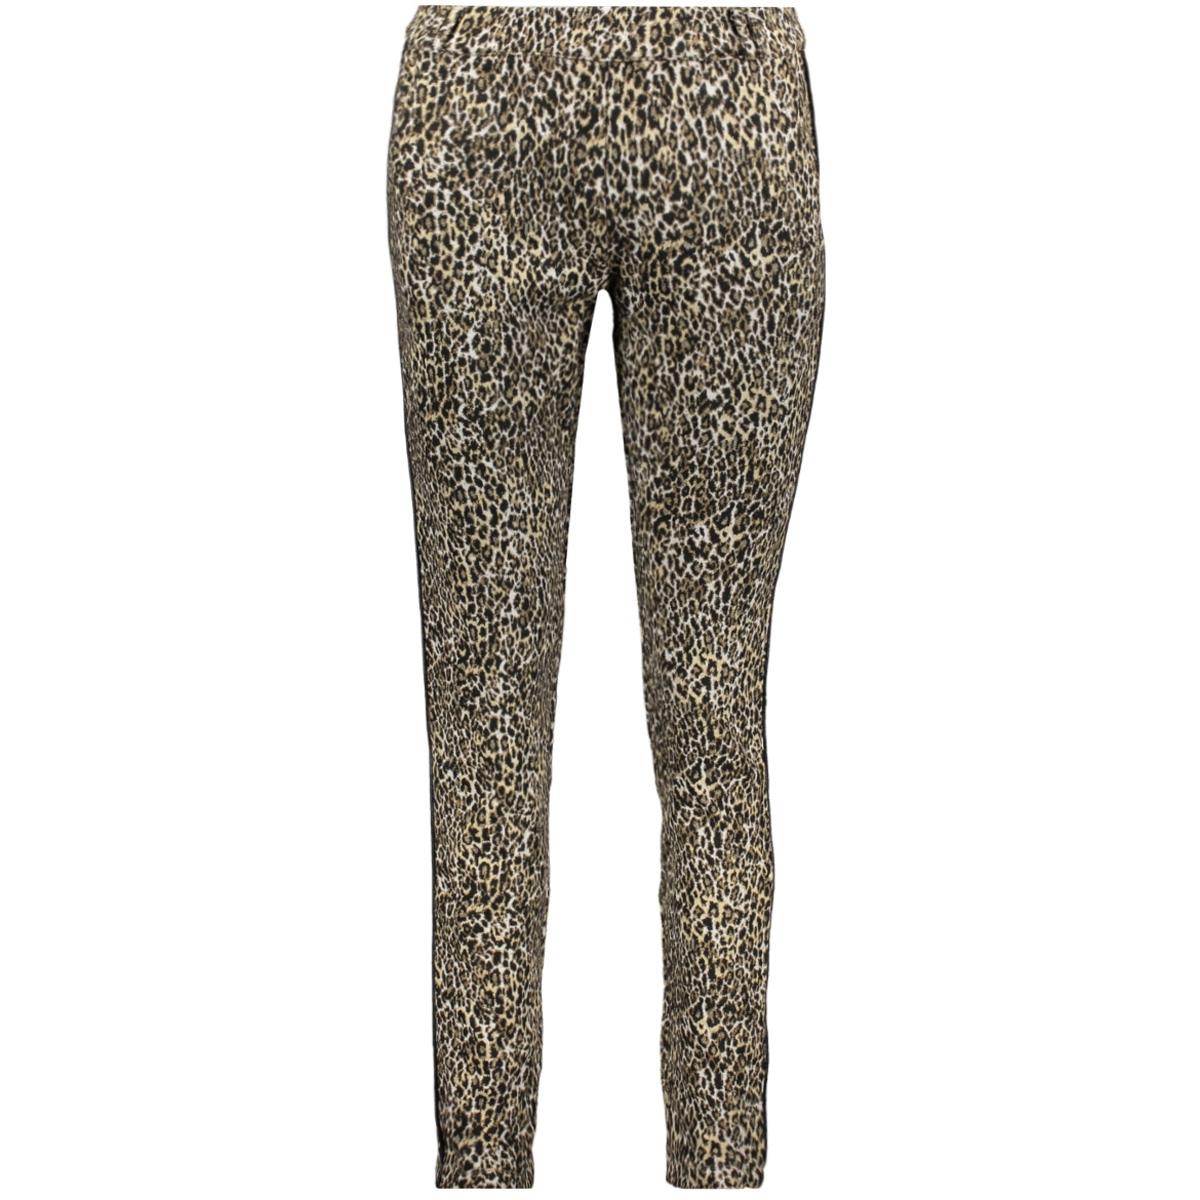 pants jaquard leopard 91556 24 geisha broek sand combi